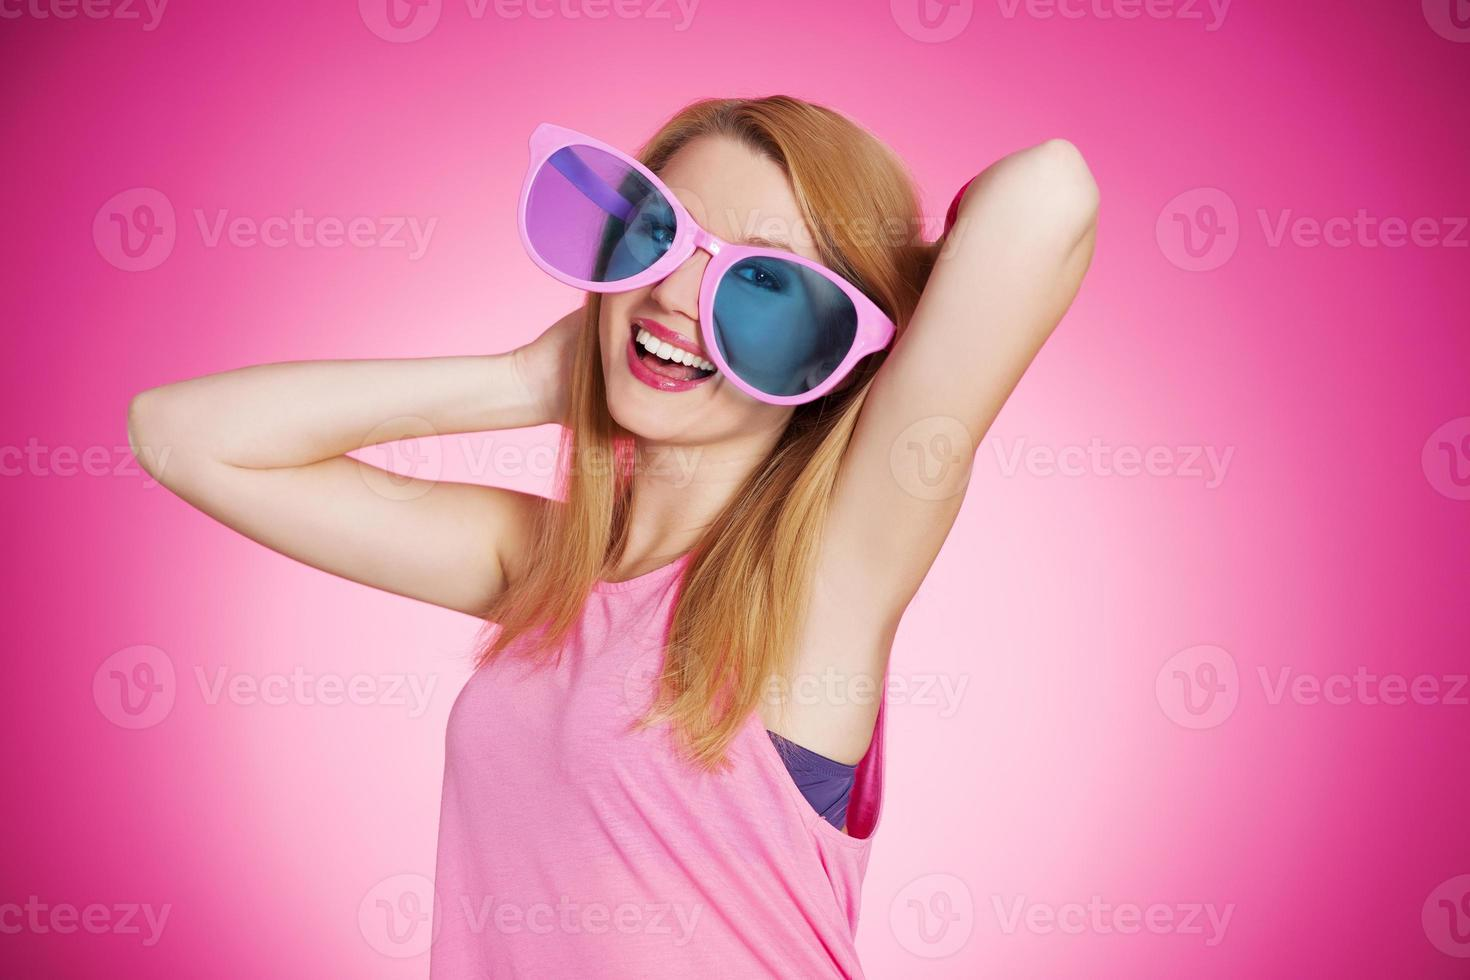 fröhliches süßes Mädchen foto